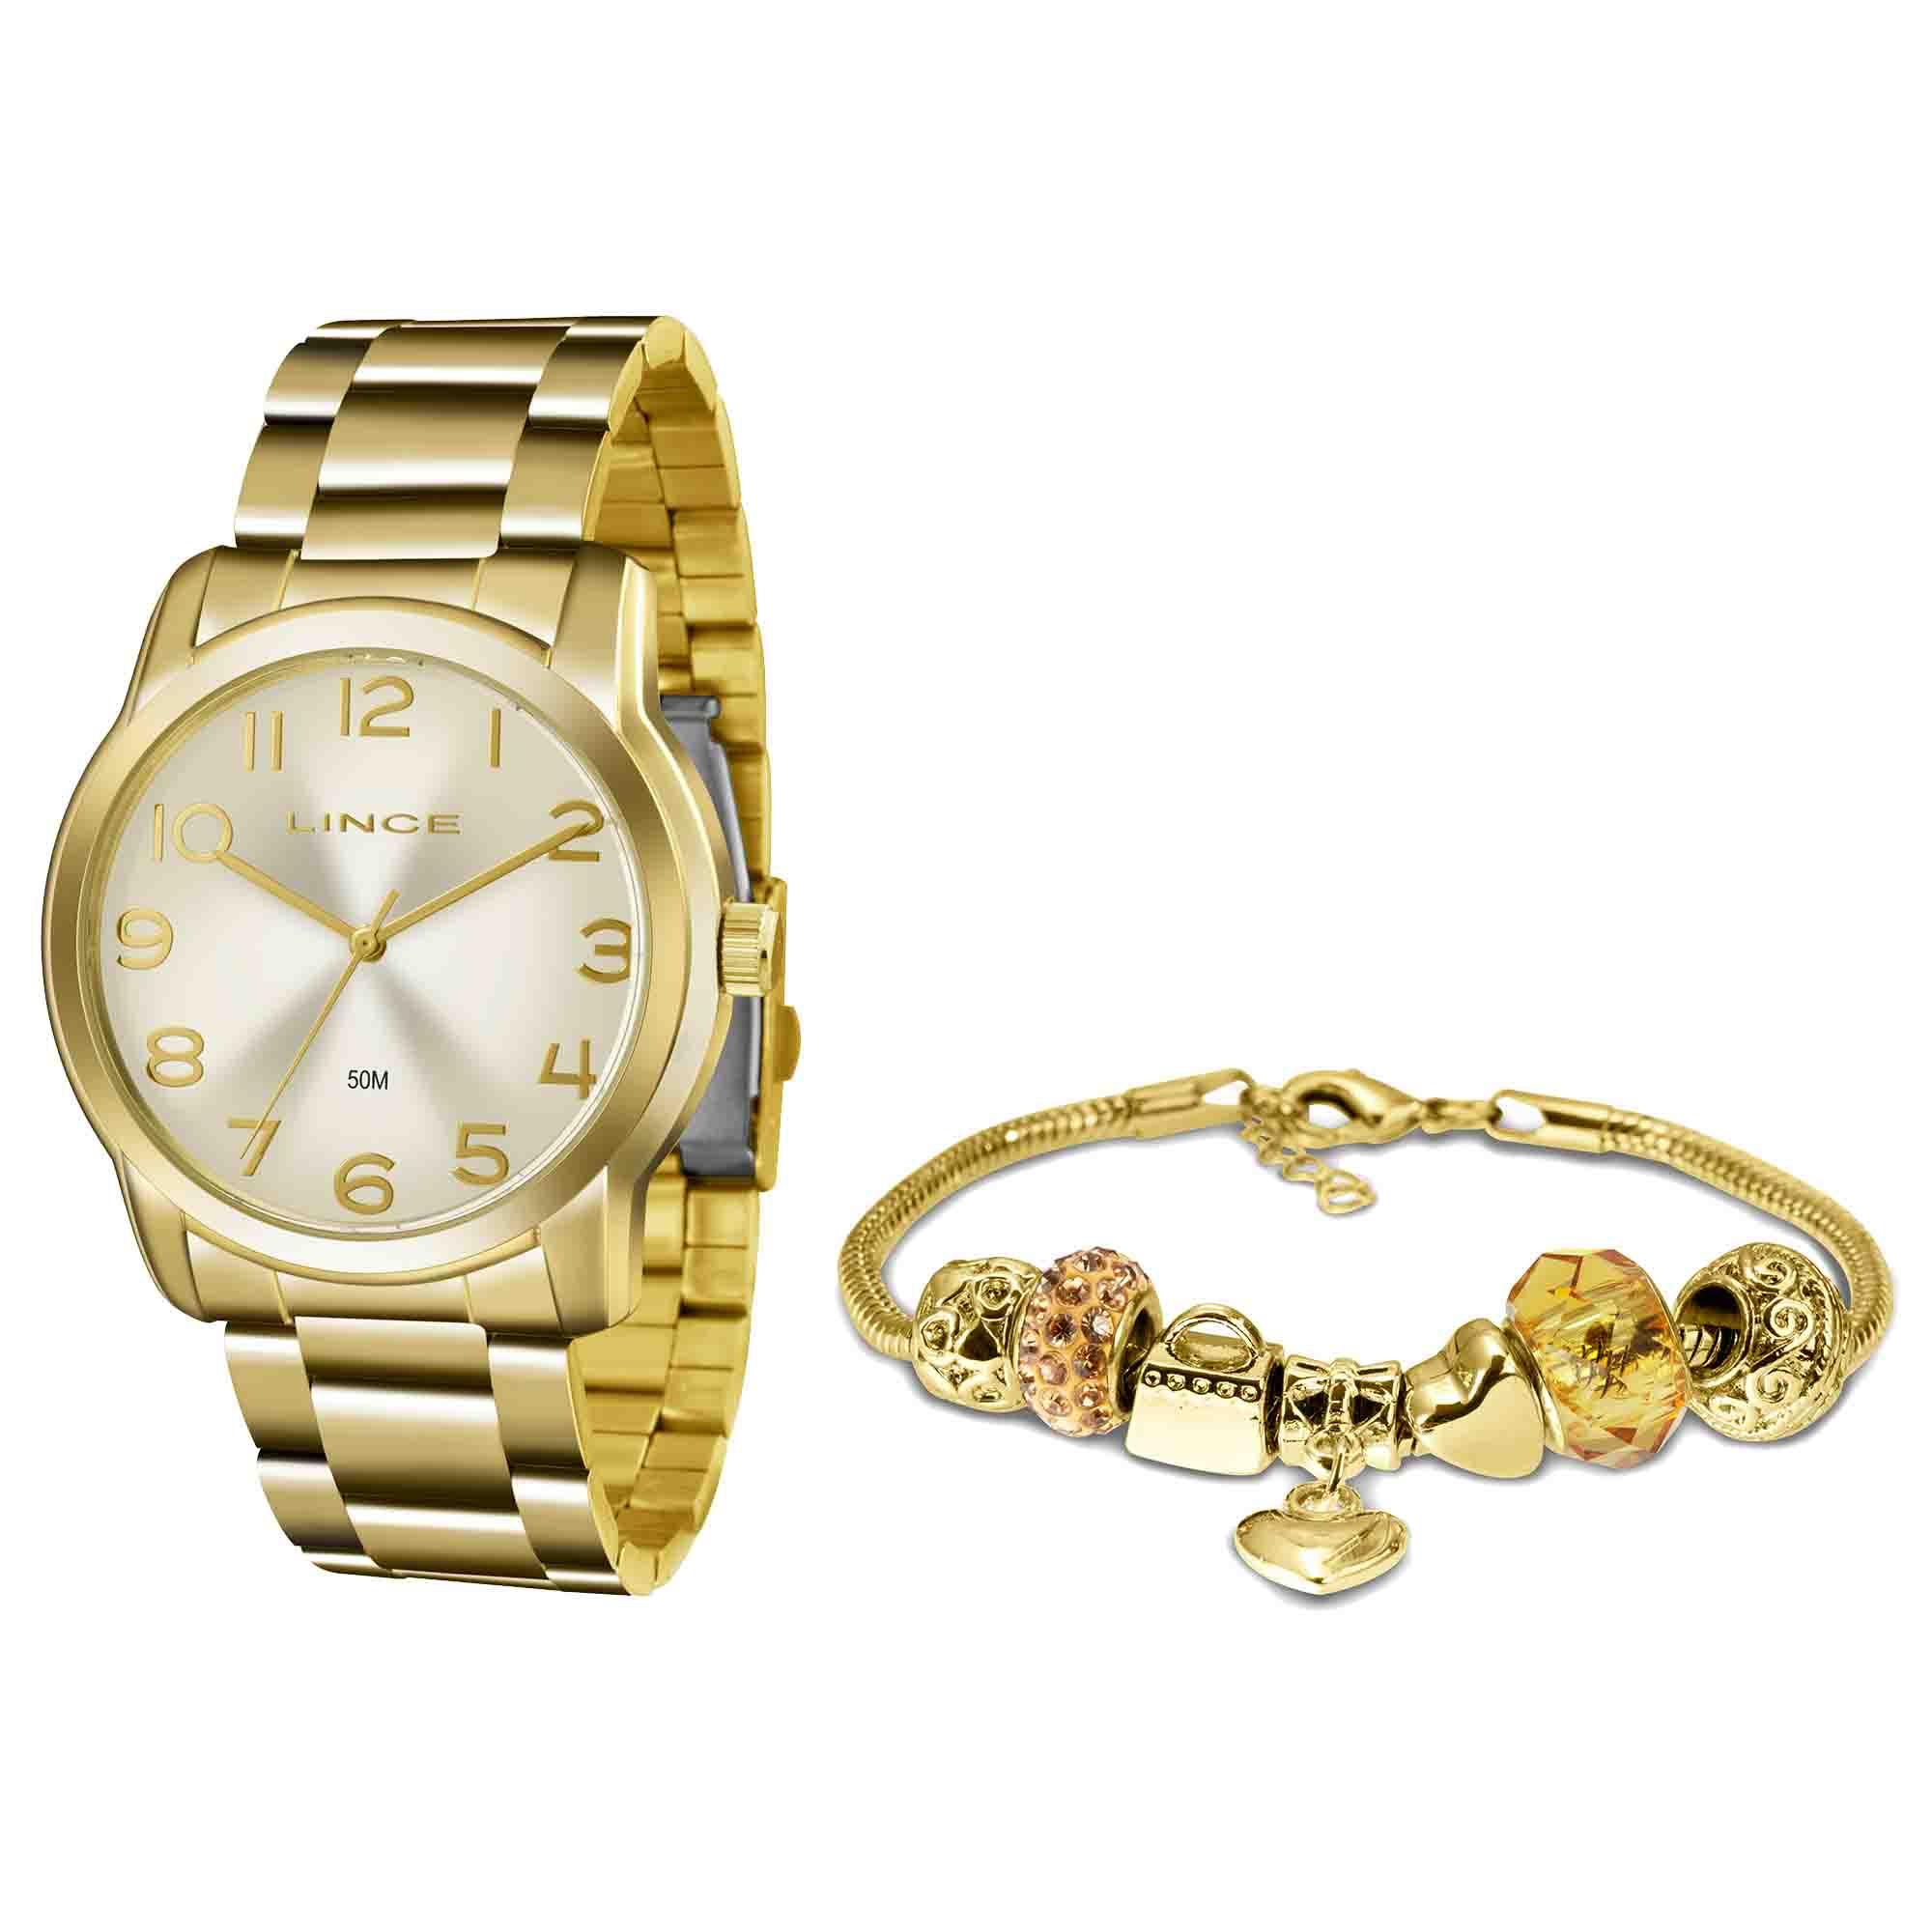 Relógio Feminino Lince LRG4550L KN49S2KX Kit com Pulseira Pandora